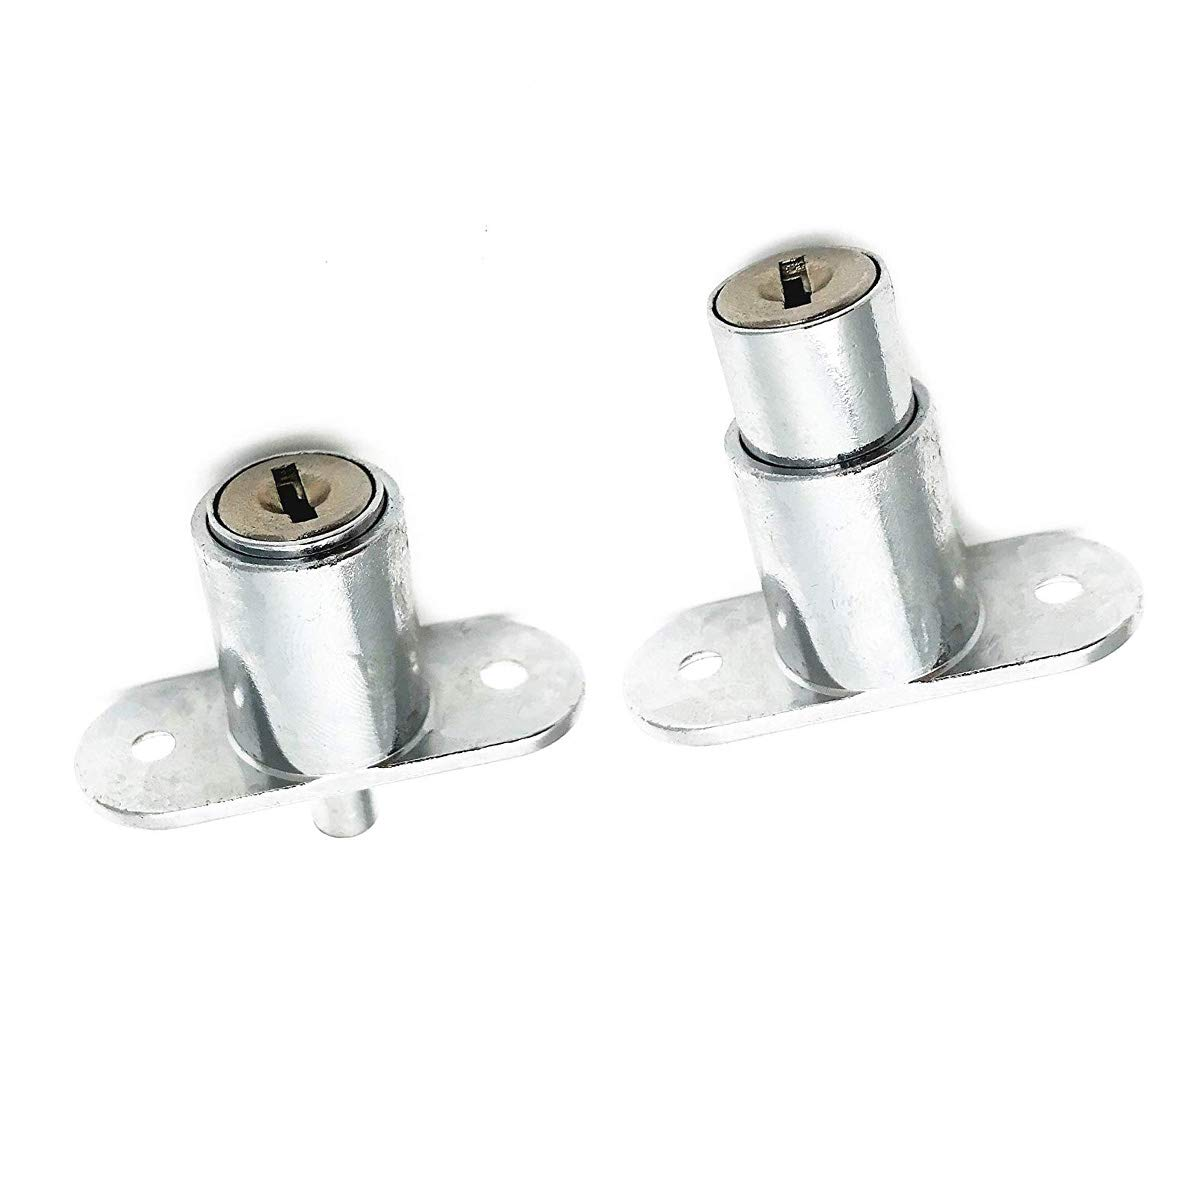 Keyed Different COMOK 6Pcs Push Plunger Lock 19mm Cylinder Zinc Alloy Chrome Finish